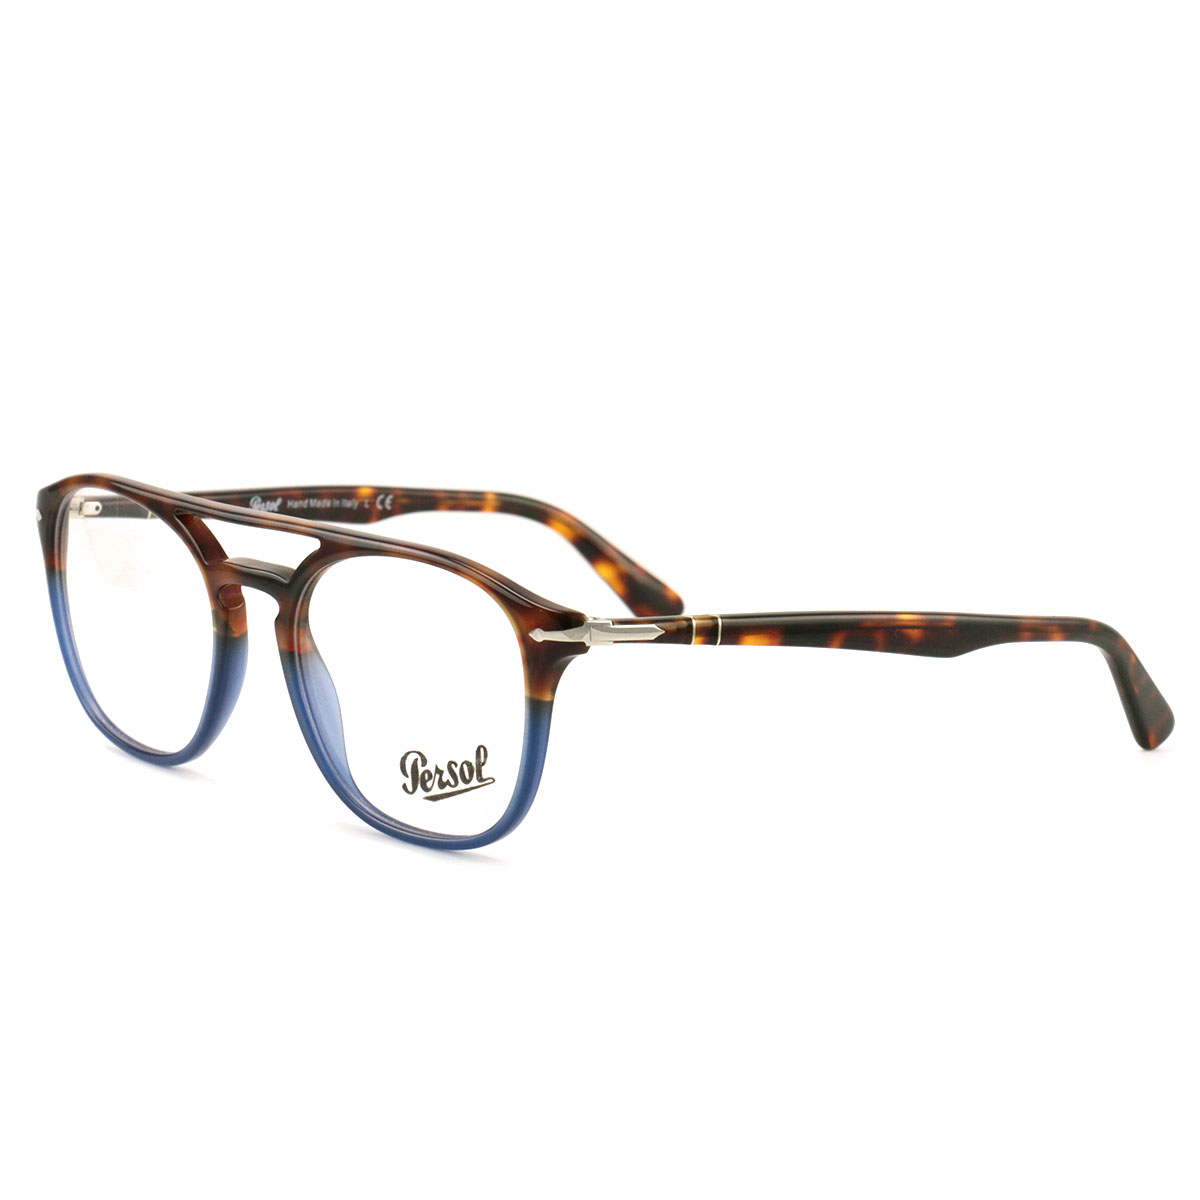 2e637f35f9c82 Persol Men Blue Square New Eyeglasses PO 3175 V 9045 Terrae Oceano 52  Plastic - Walmart.com